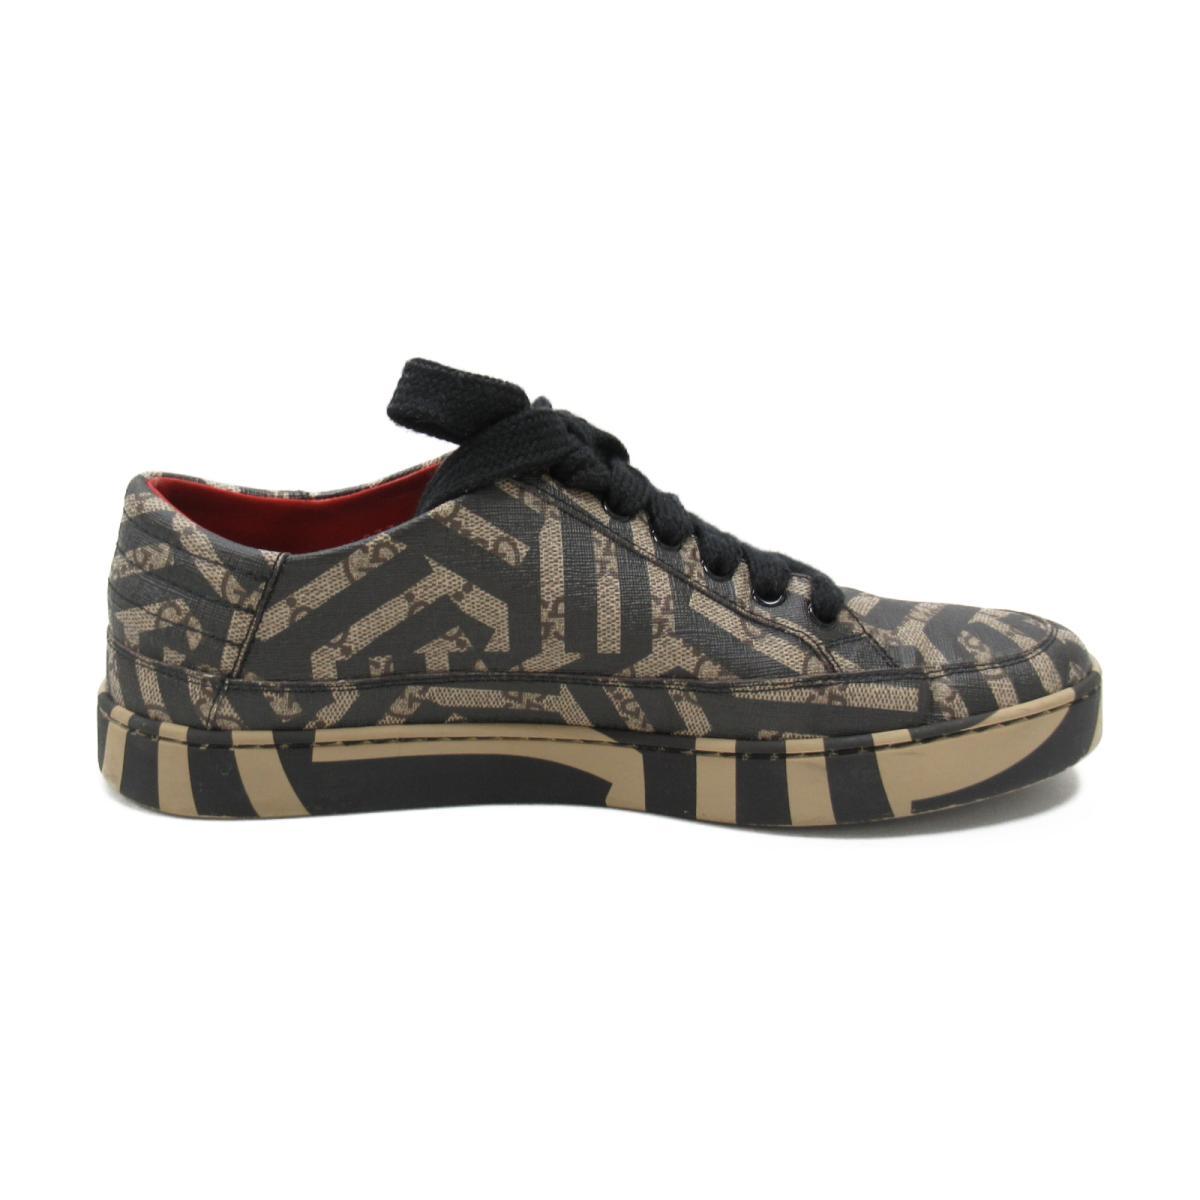 0c168e48ca7 BRANDOFF  Gucci sneakers clothing men PVC black x beige system ...